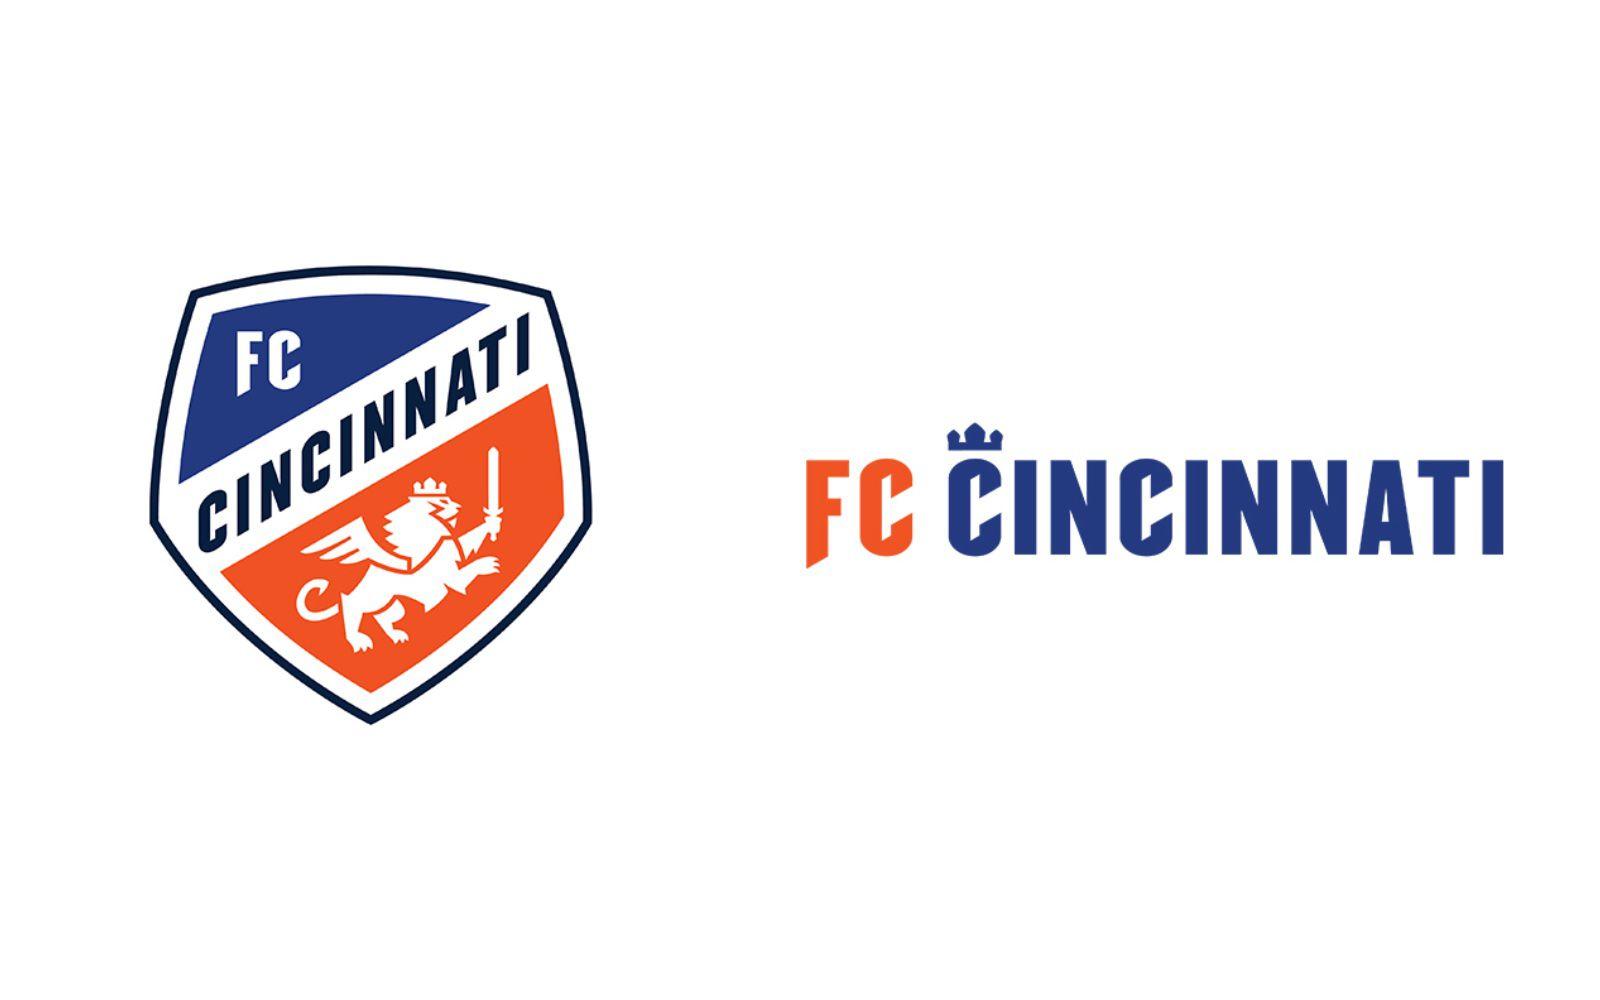 Mls Team From 2019 New Fc Cincinnati Logo Identity